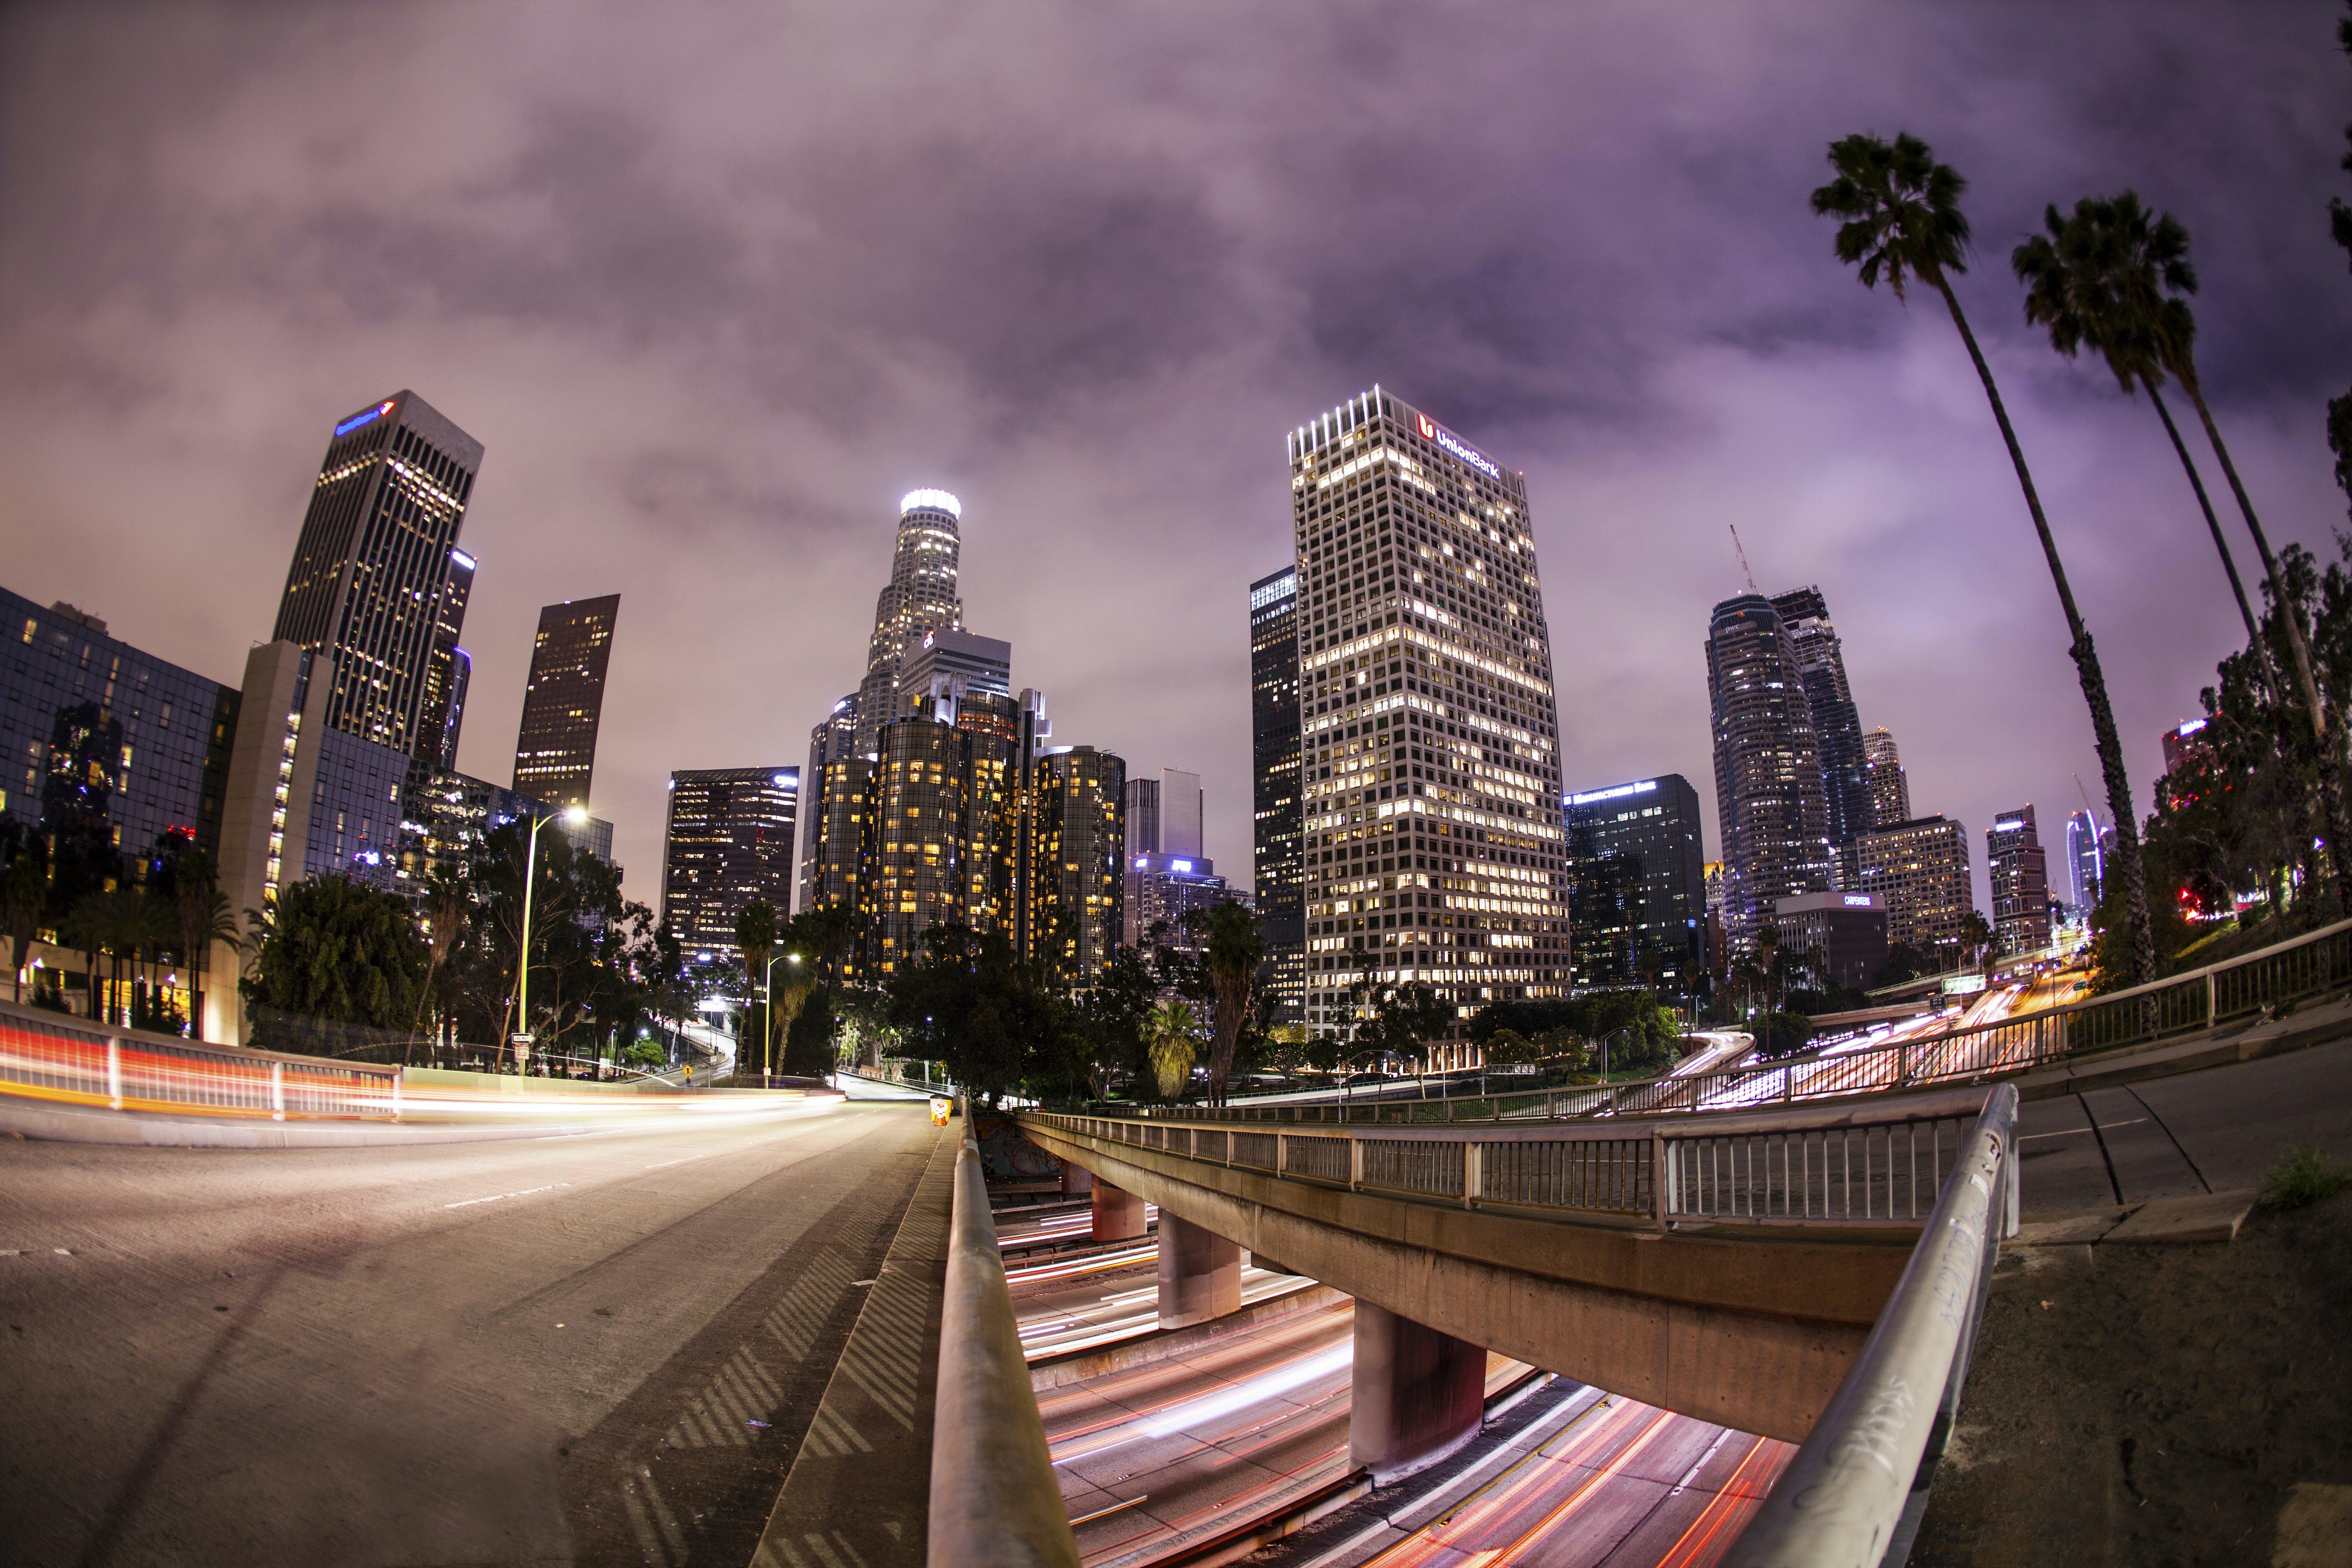 Landscape City